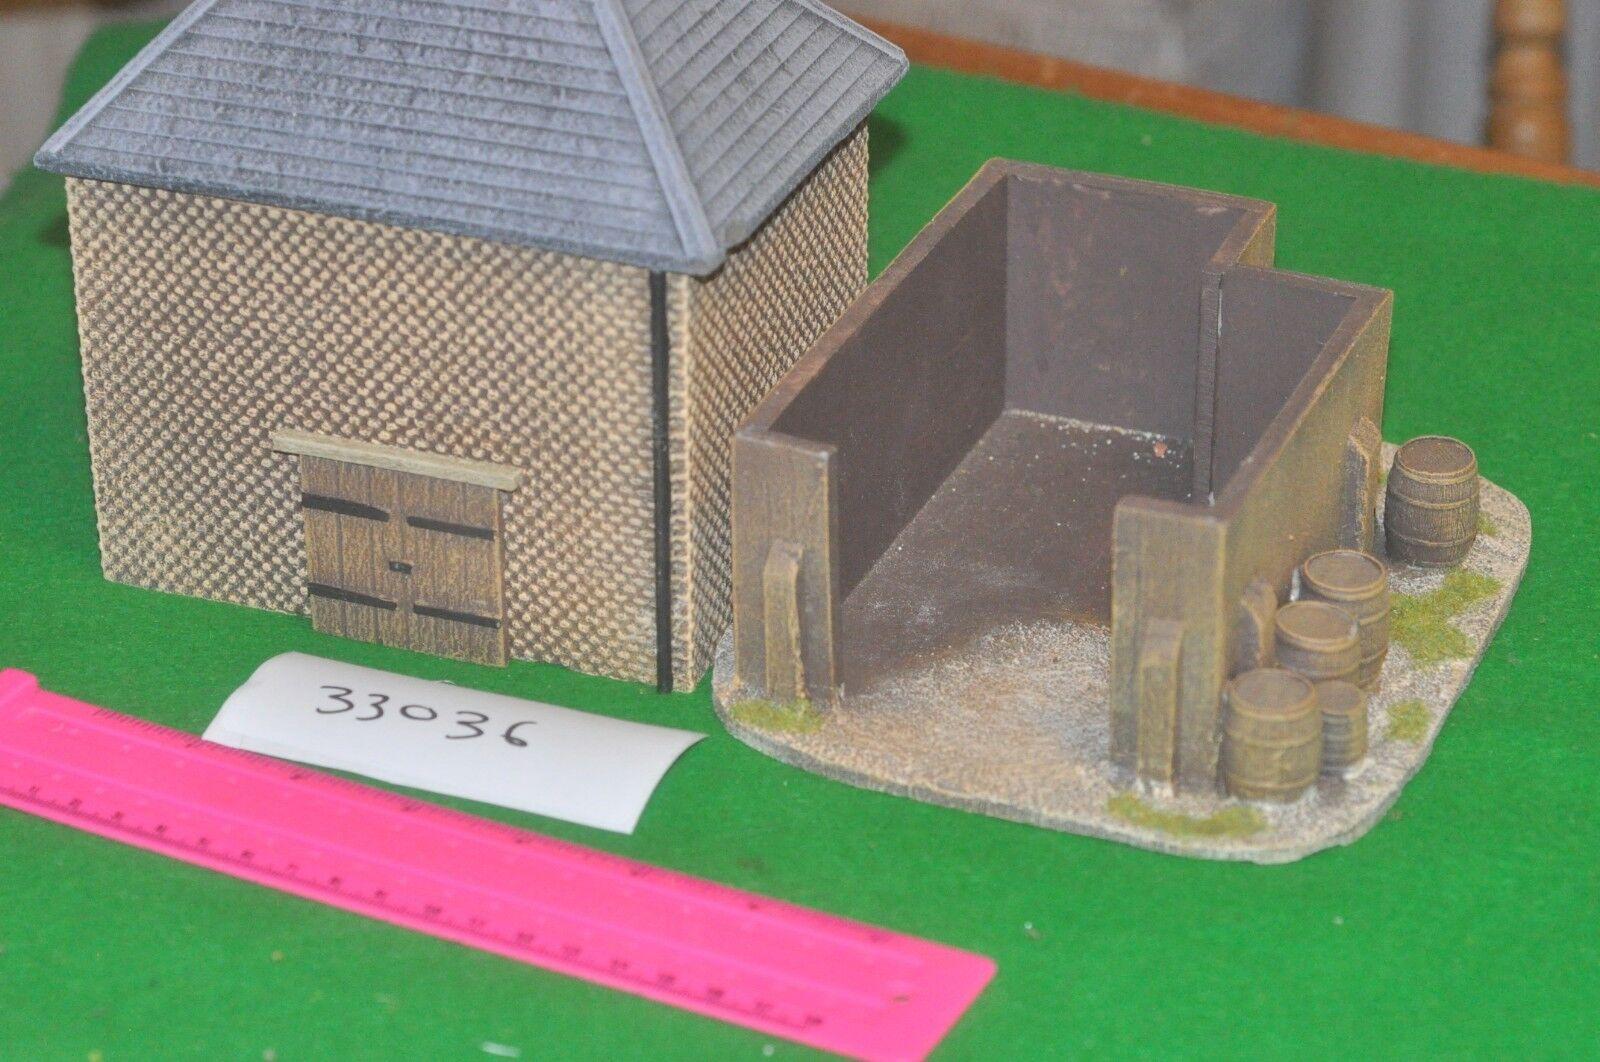 25mm   - garage & storage shed - scenics (33036)